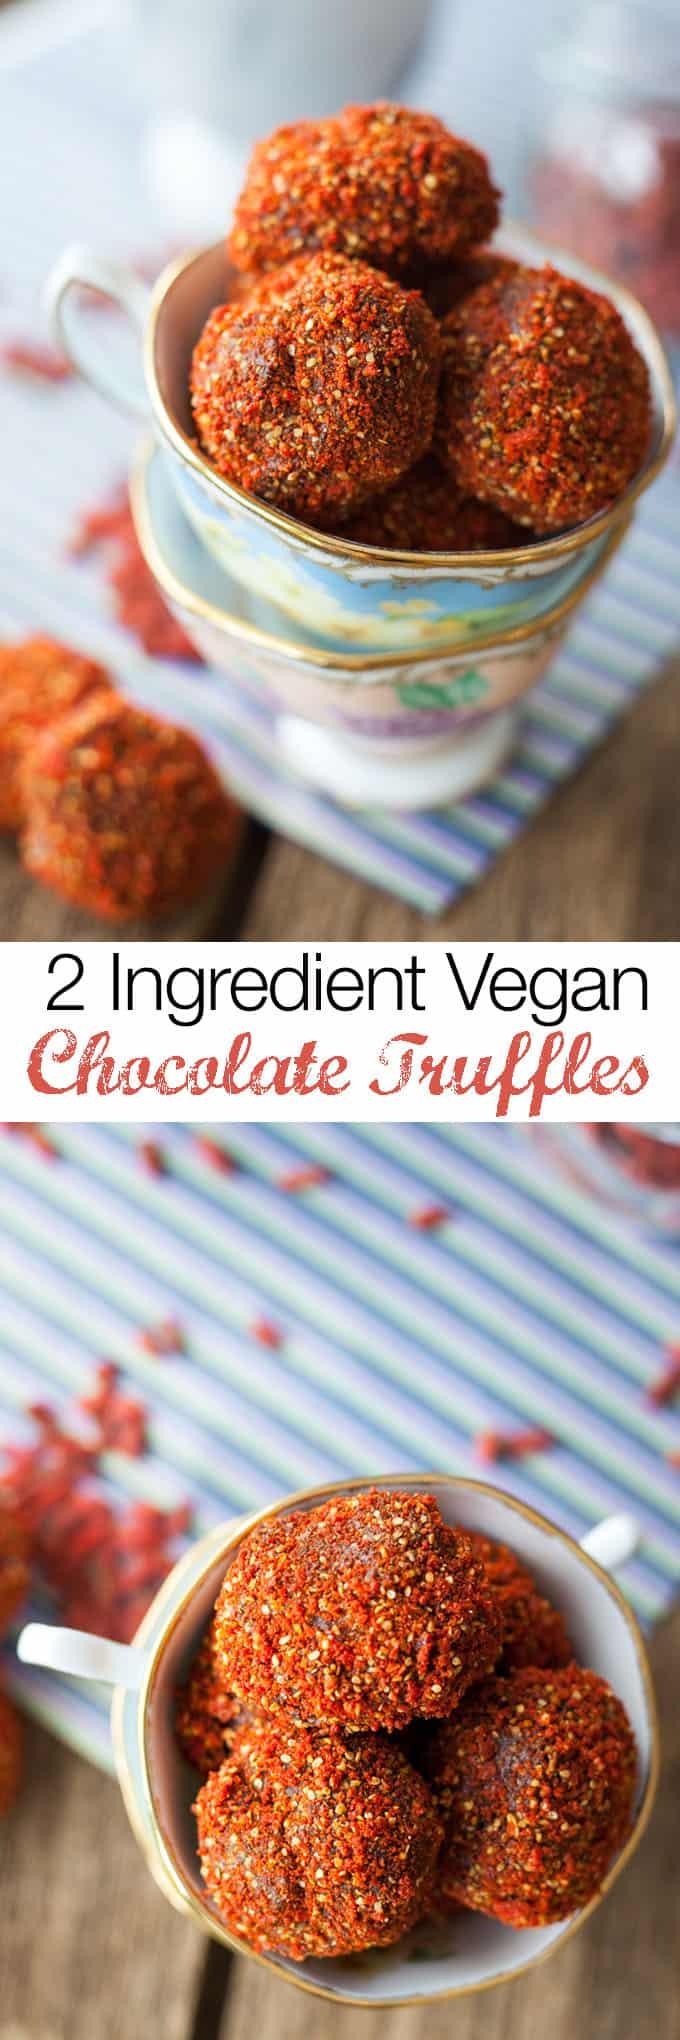 Vegan Chocolate Truffles recipes